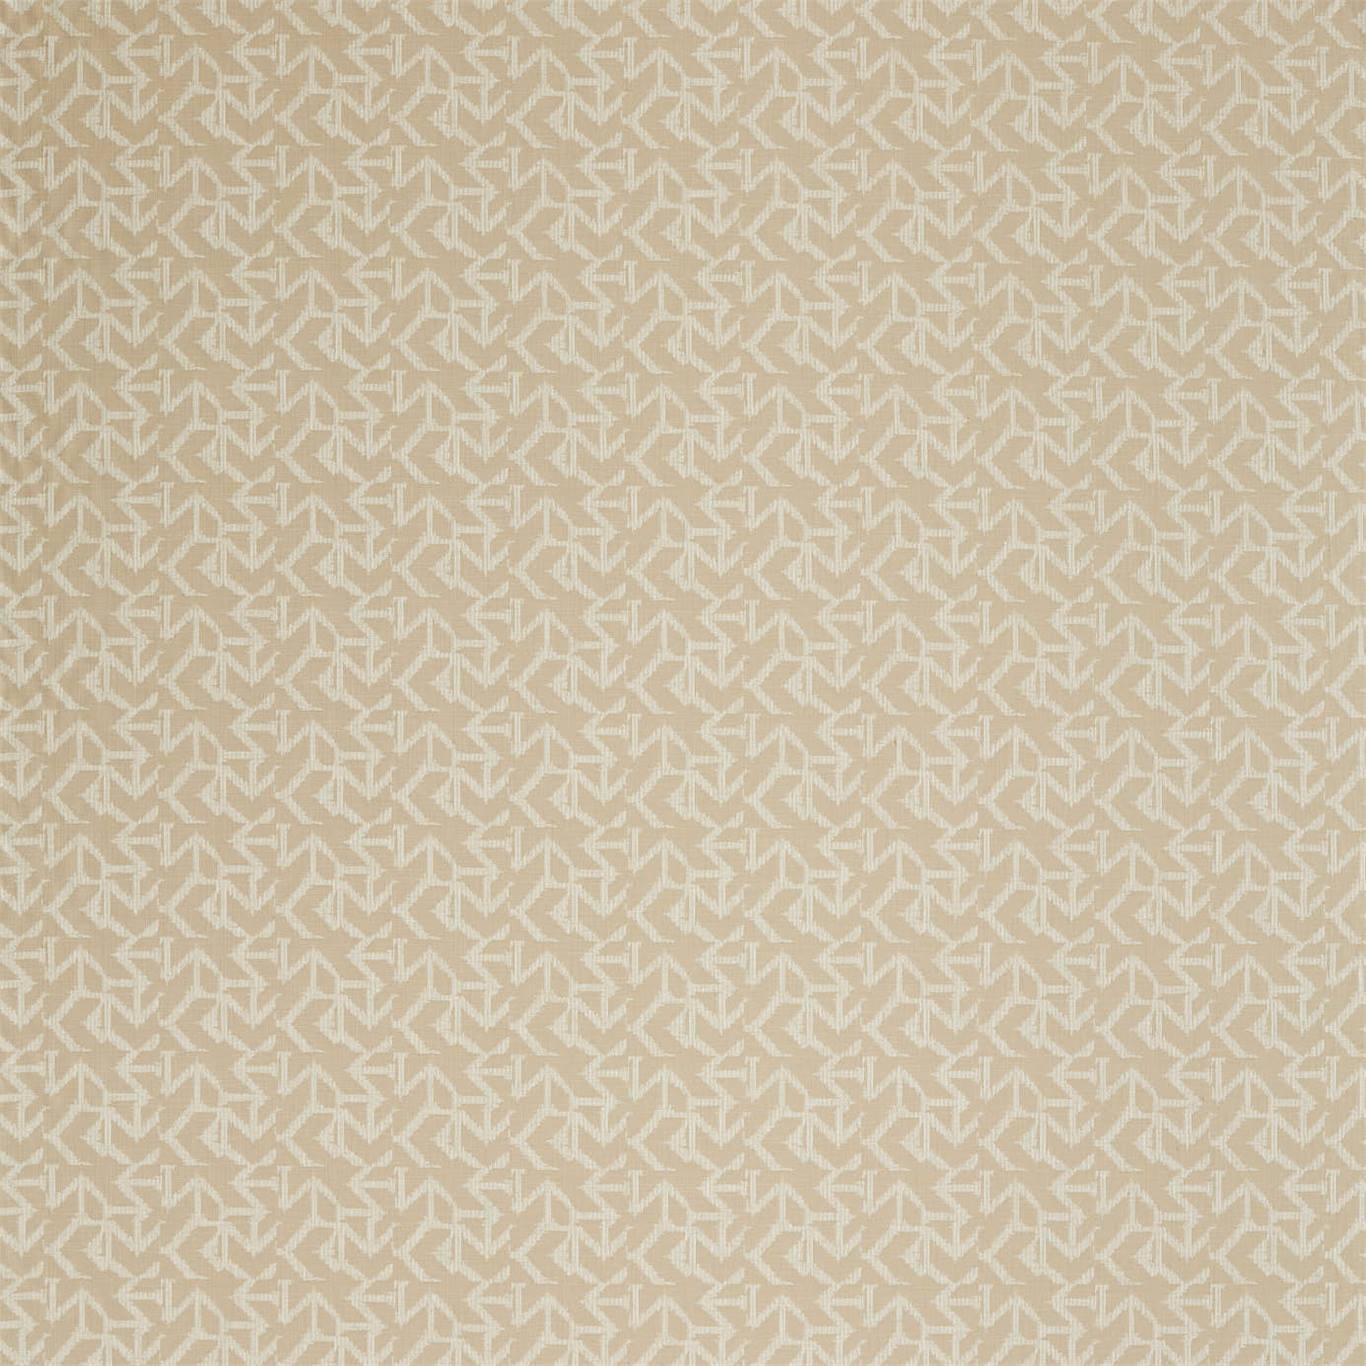 Image of Harlequin Moremi Jute Fabric 133073